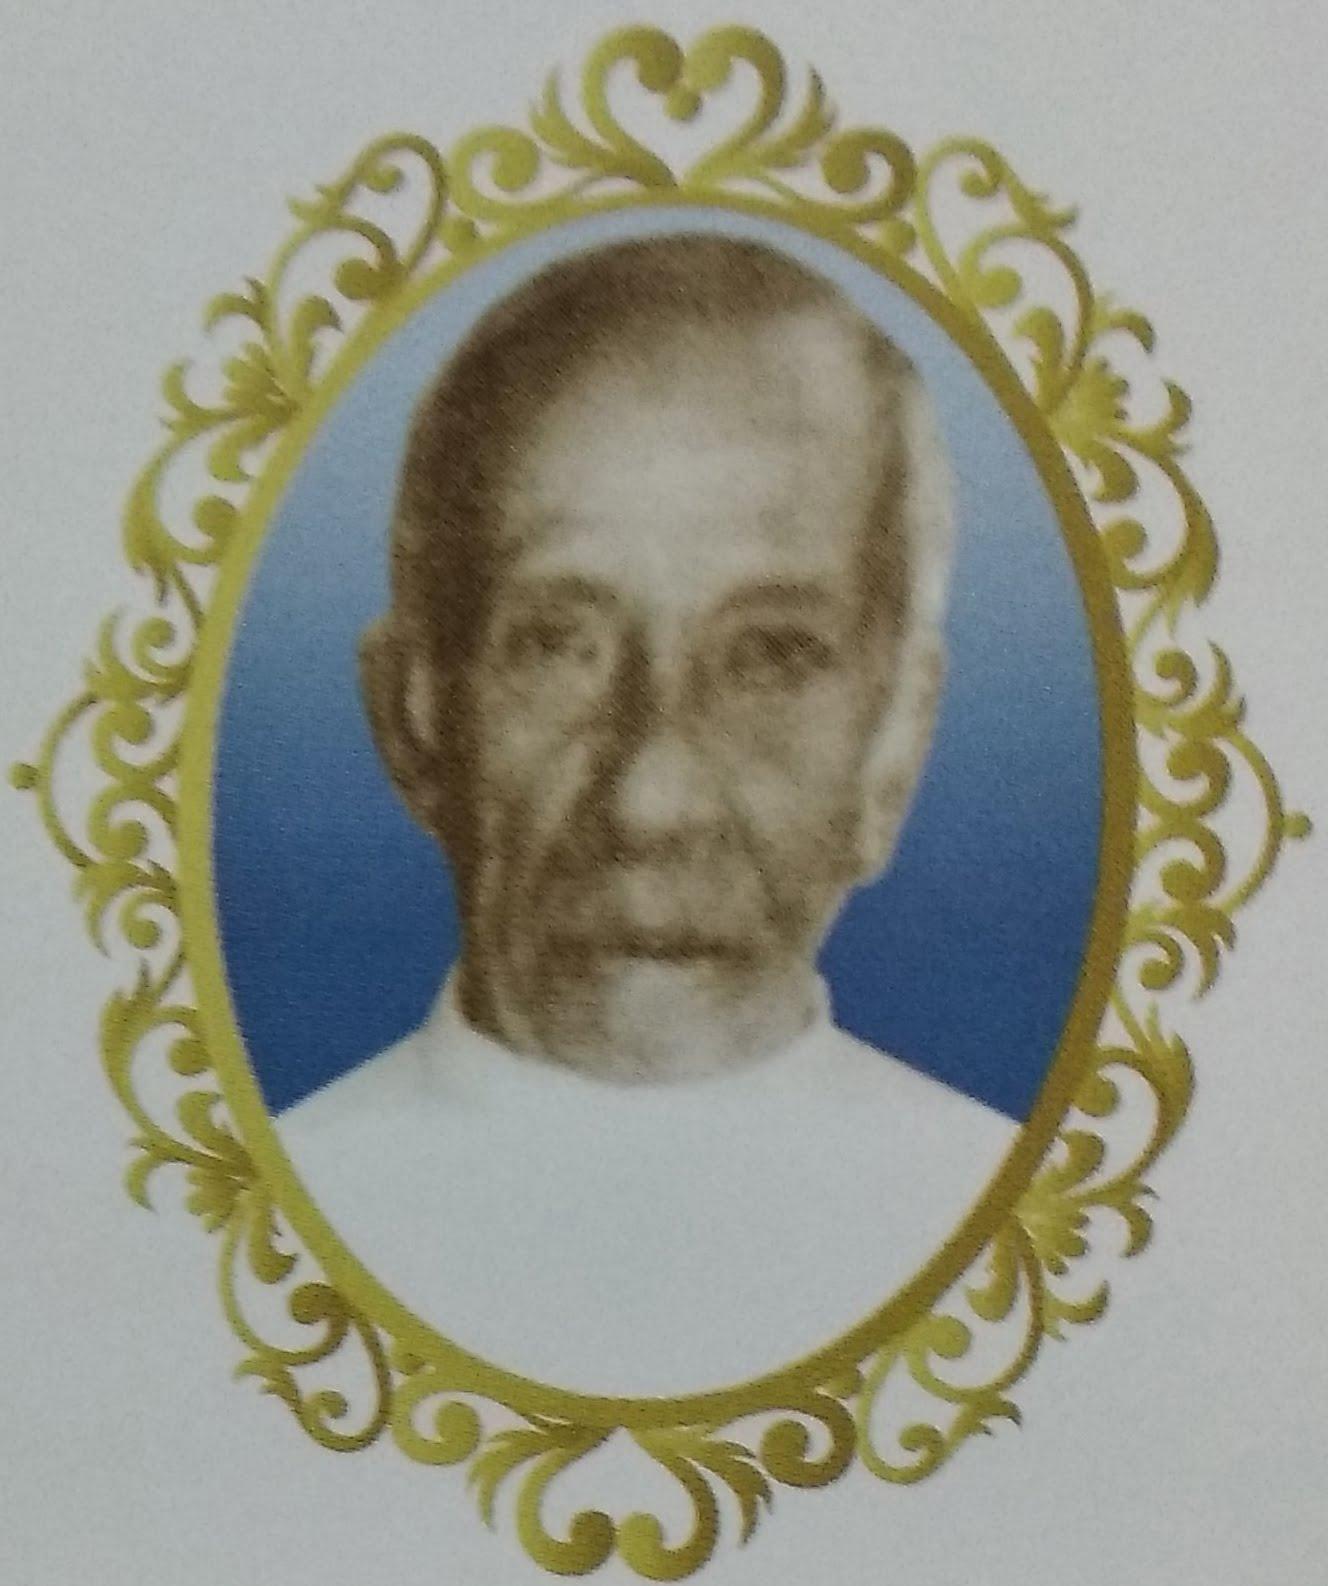 Fr. John Variath